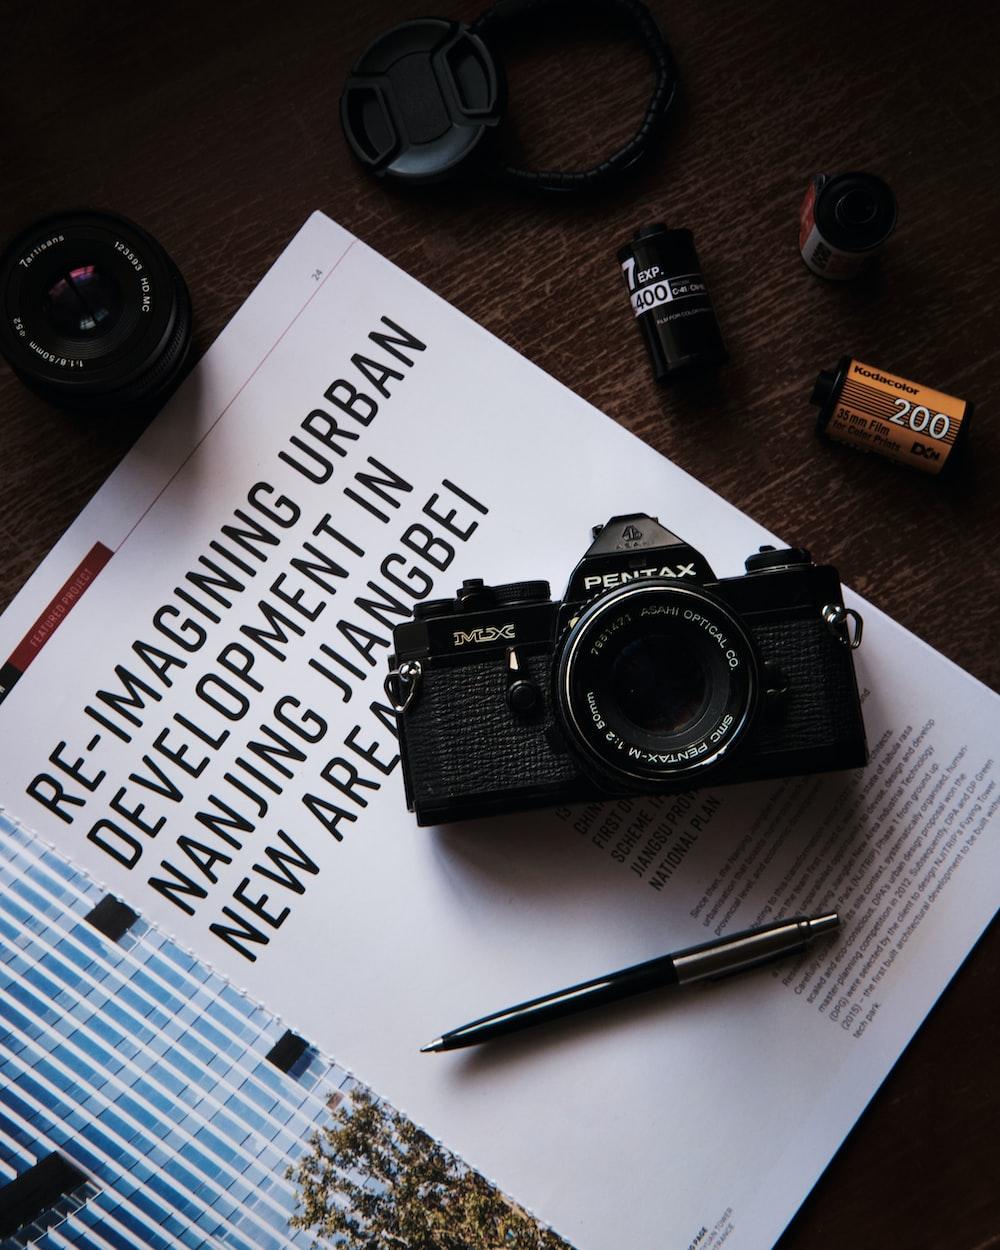 black nikon dslr camera beside brown and black click pen on white printer paper